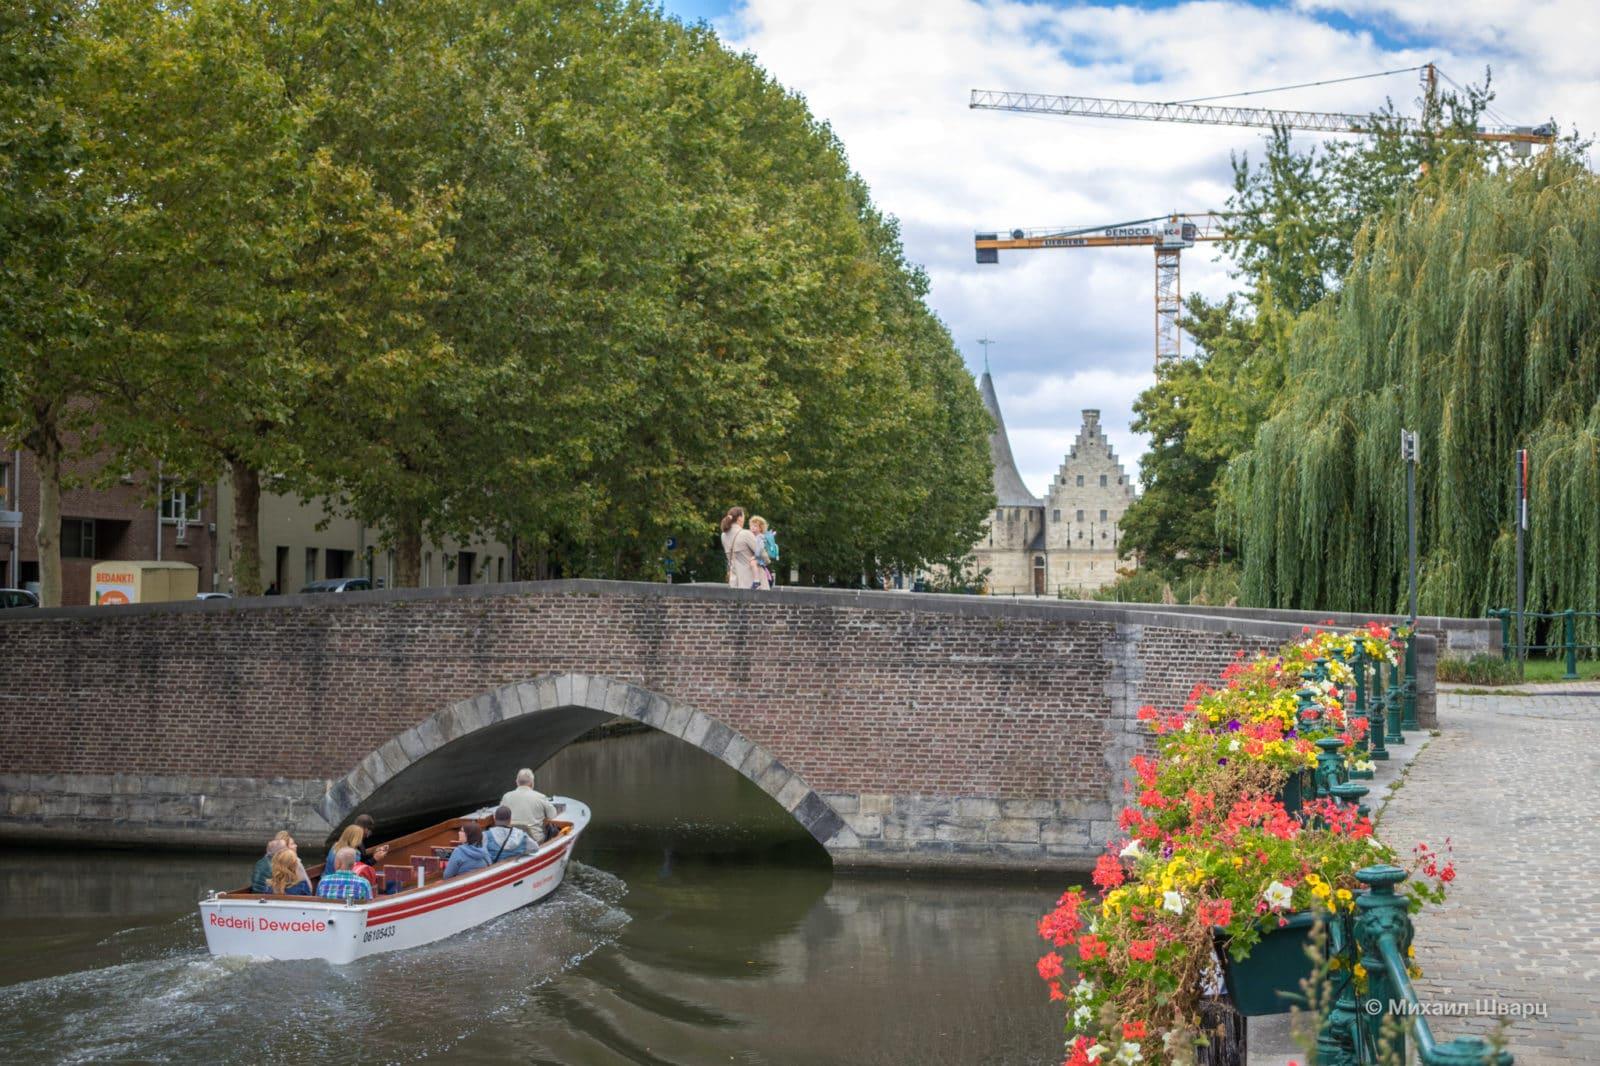 Вид с моста Lodewijk van Malestraat